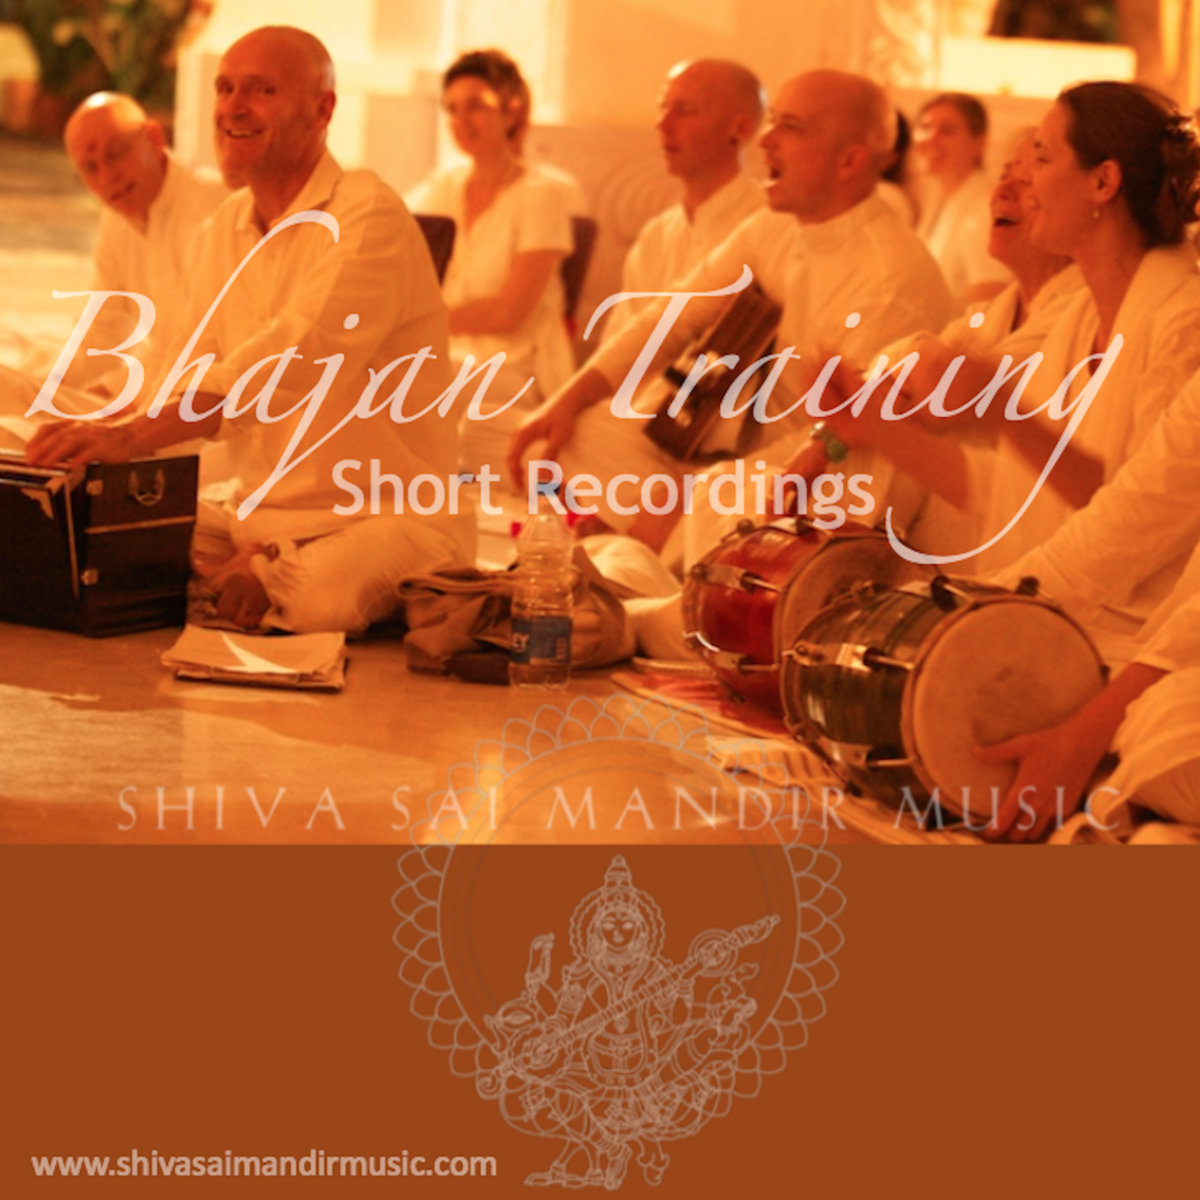 Bhajan Training Short Recordings | Shiva Sai Mandir Music